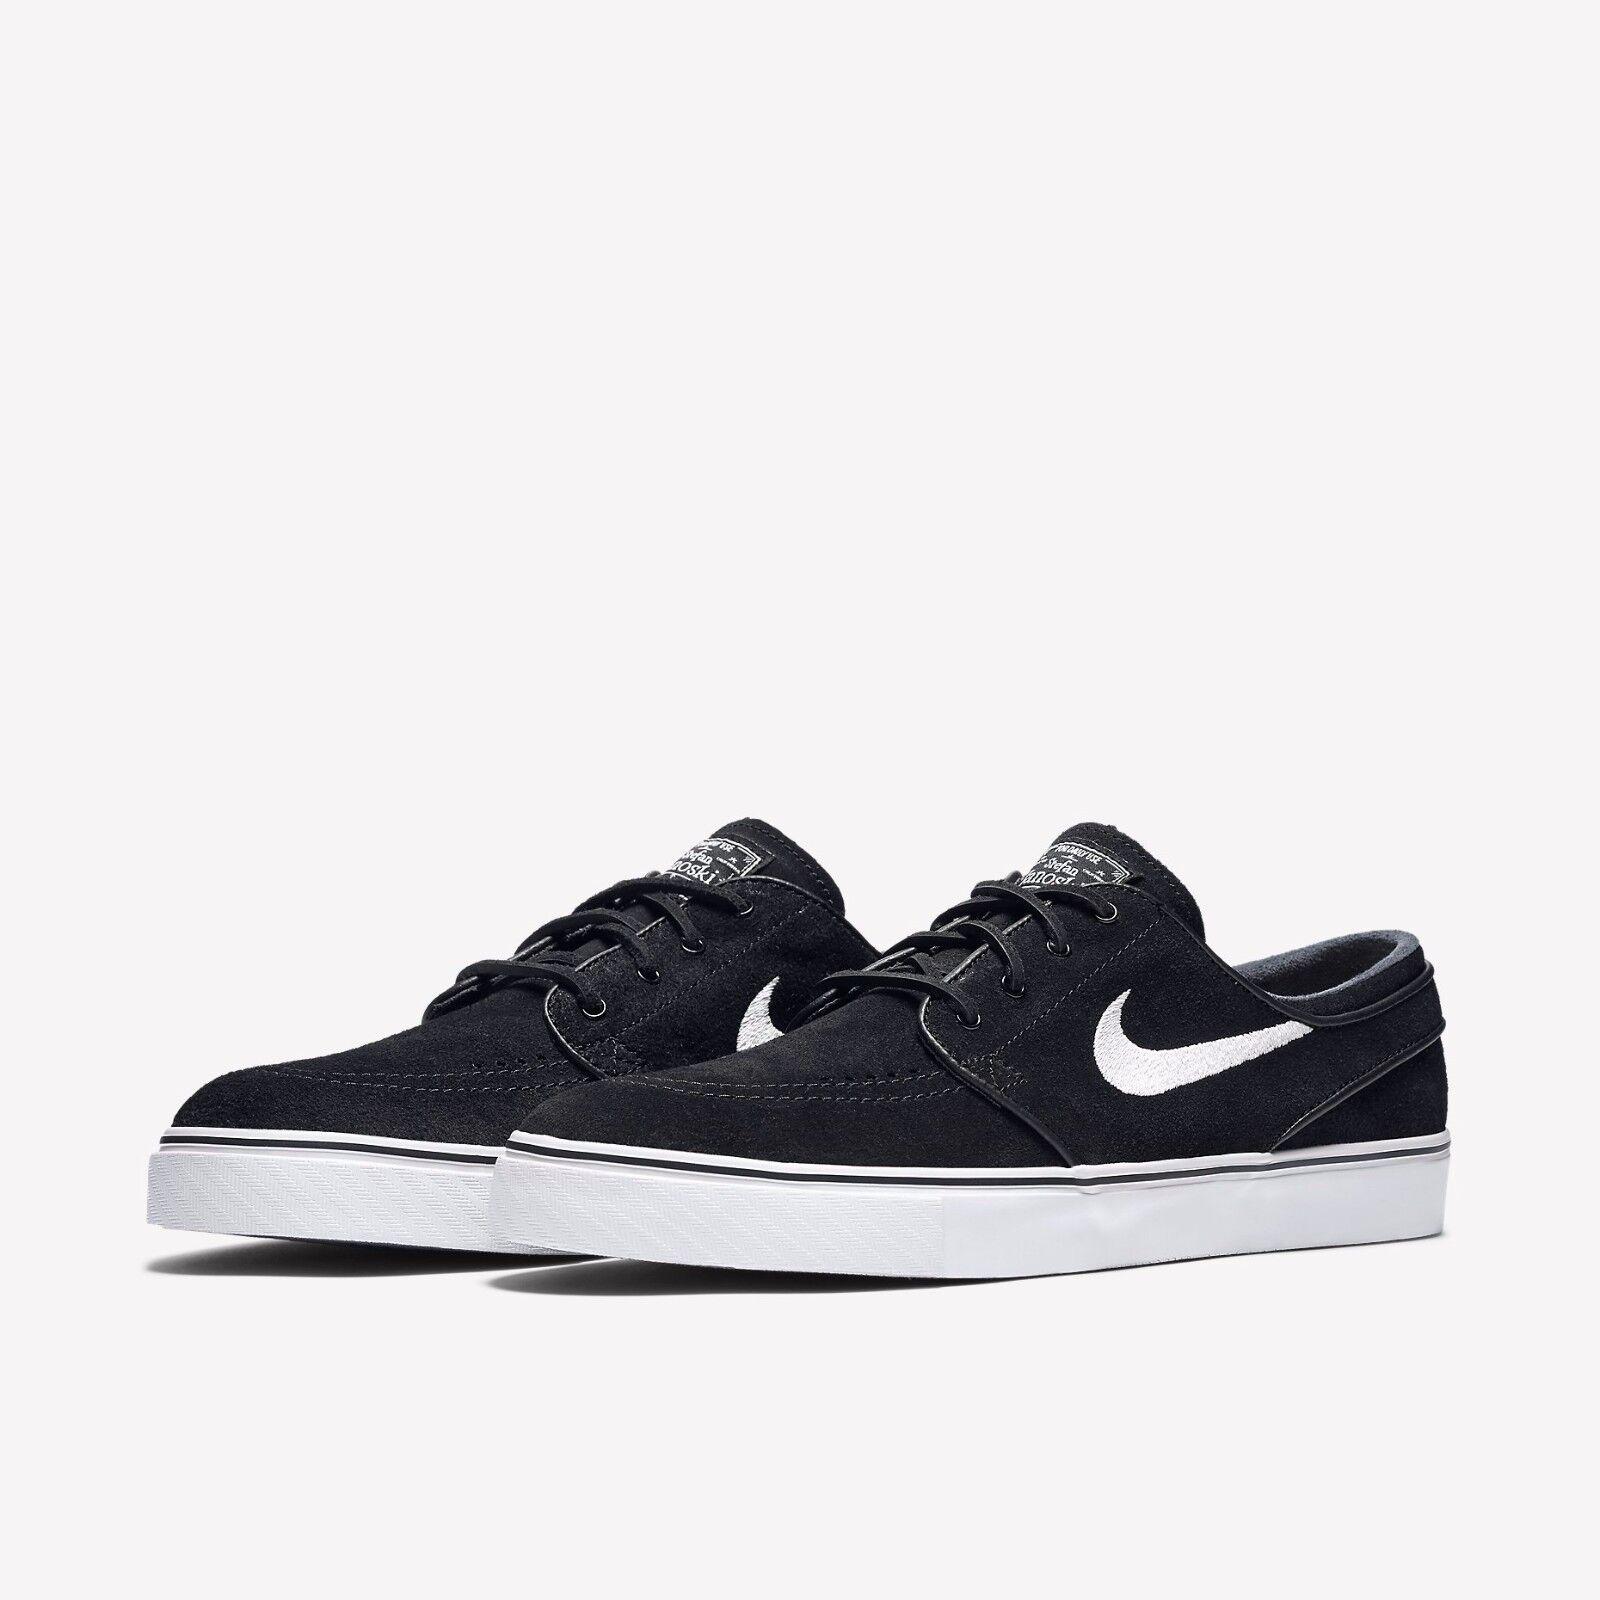 Nike Blanco SB Zoom Stefan Janoski Hombre Suede Negro Blanco Nike Zapatos  Nuevo Talla 399cc4